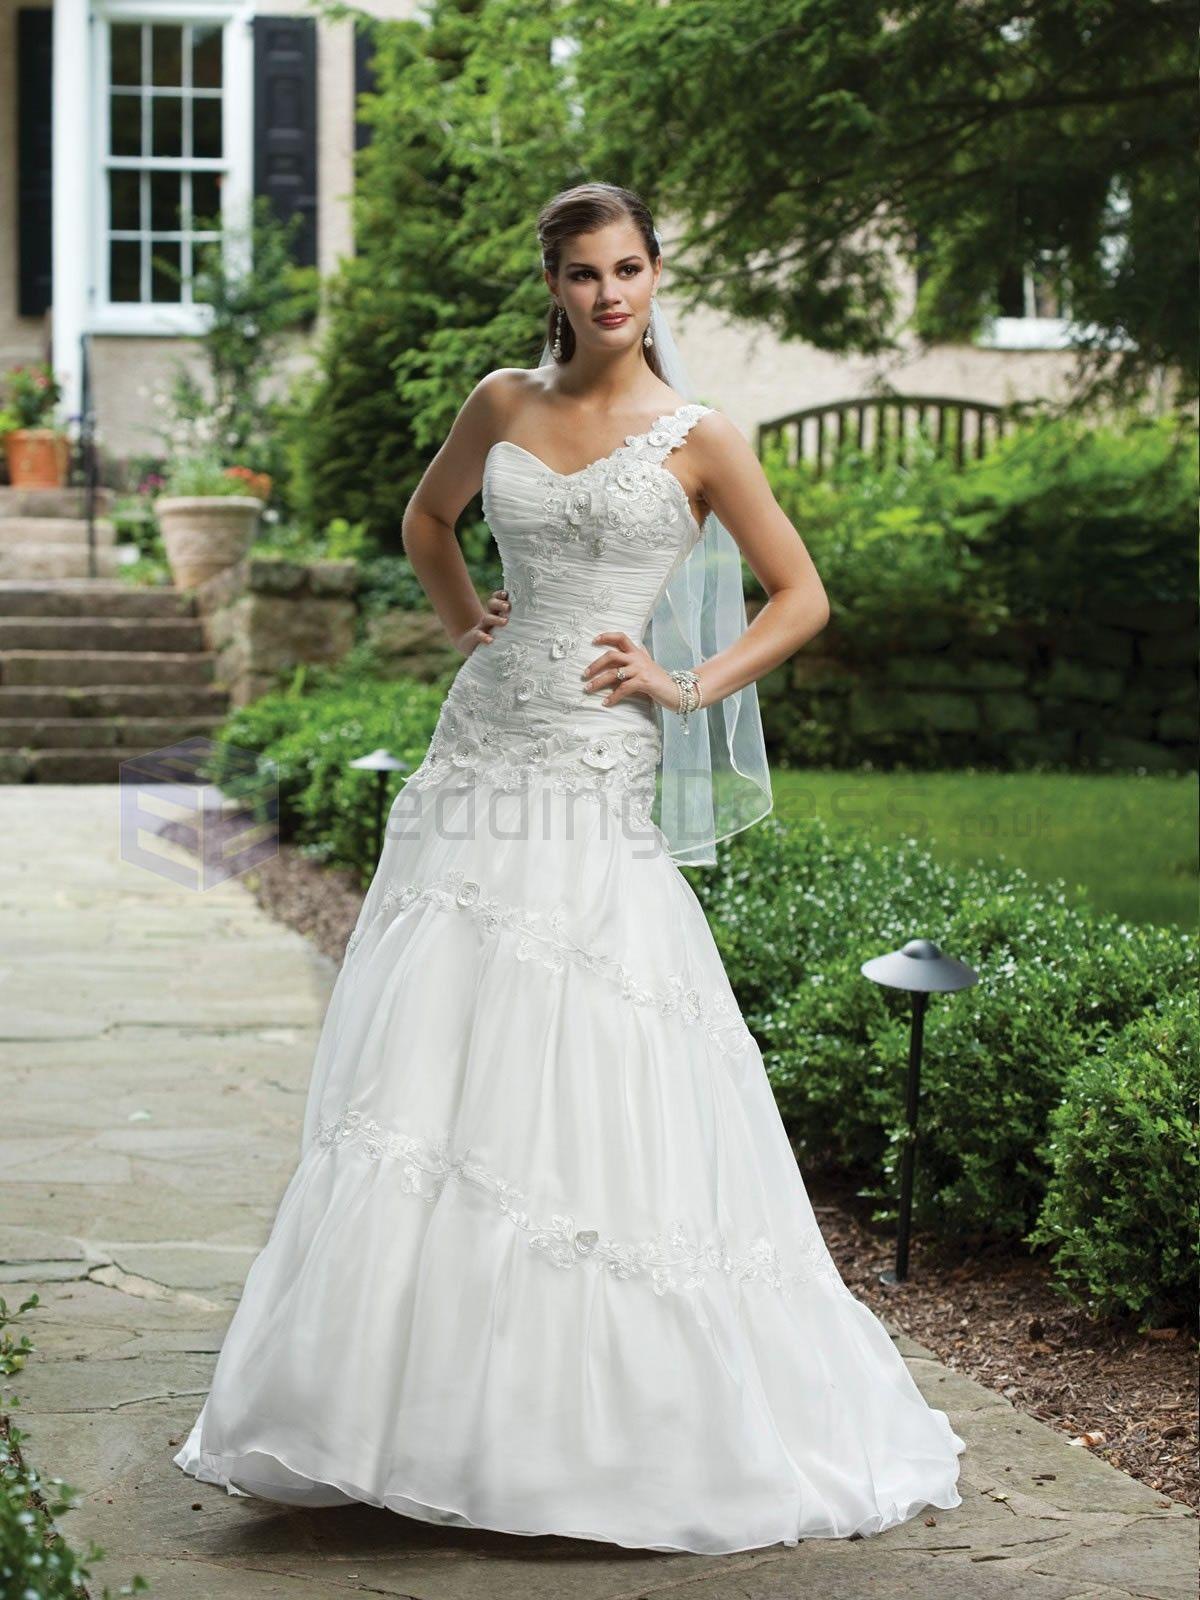 Green and white wedding dress  Ball Gown Organza Detachable Asymmetrical Single Shoulder Bodice